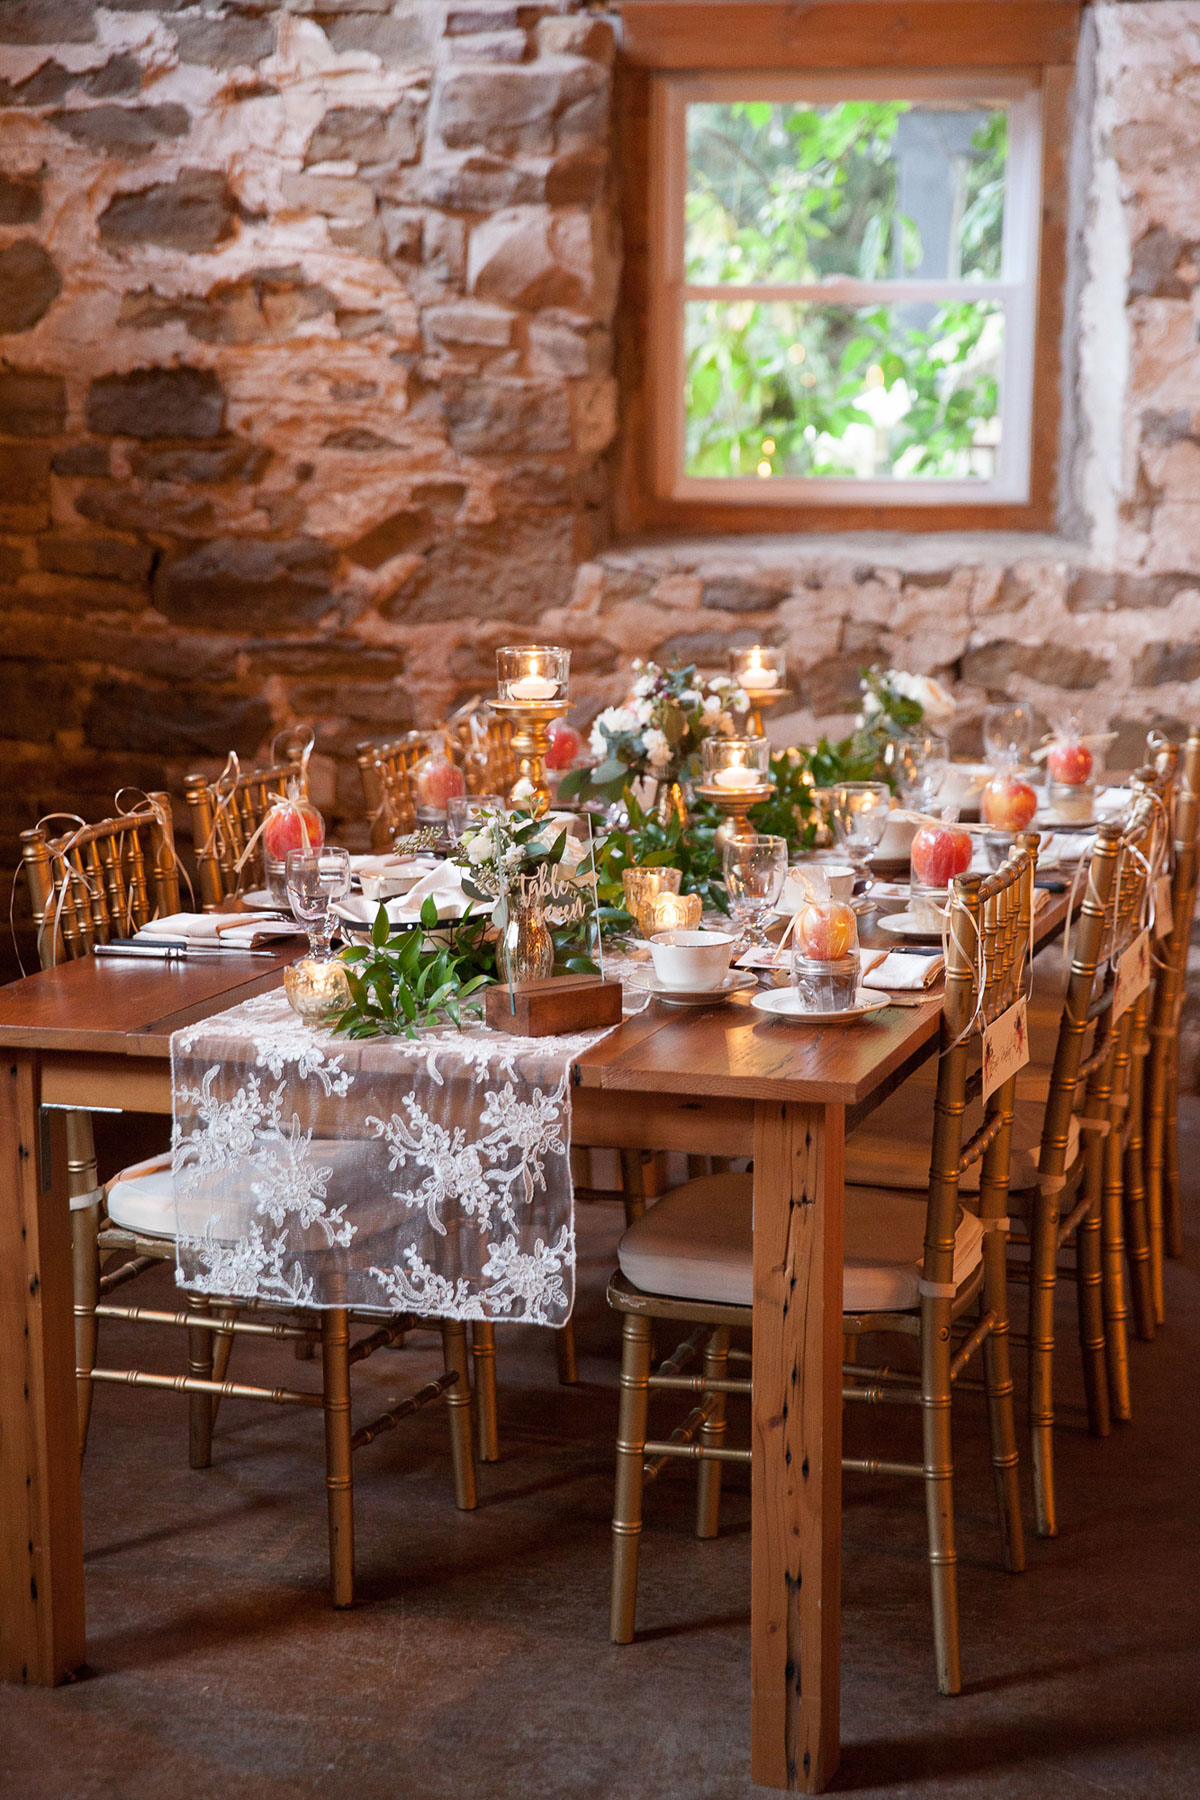 gemini-photography-vineyard-bride-swish-list-honsberger-estates-jordan-wedding-7.jpg